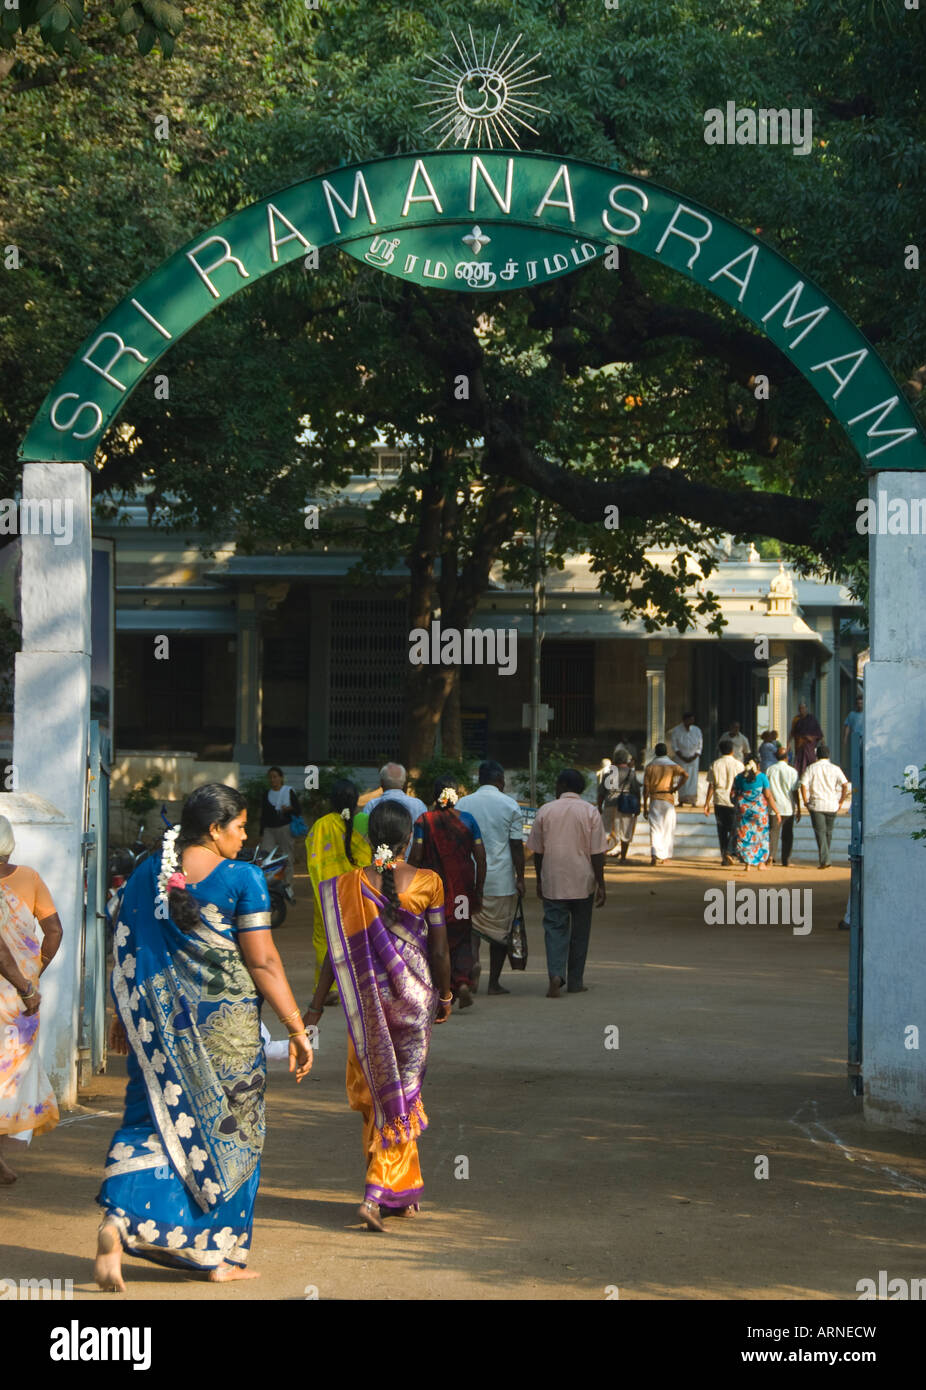 People enter Sri Ramanasramam in Tiruvannamalai in Tamil Nadu India - Stock Image